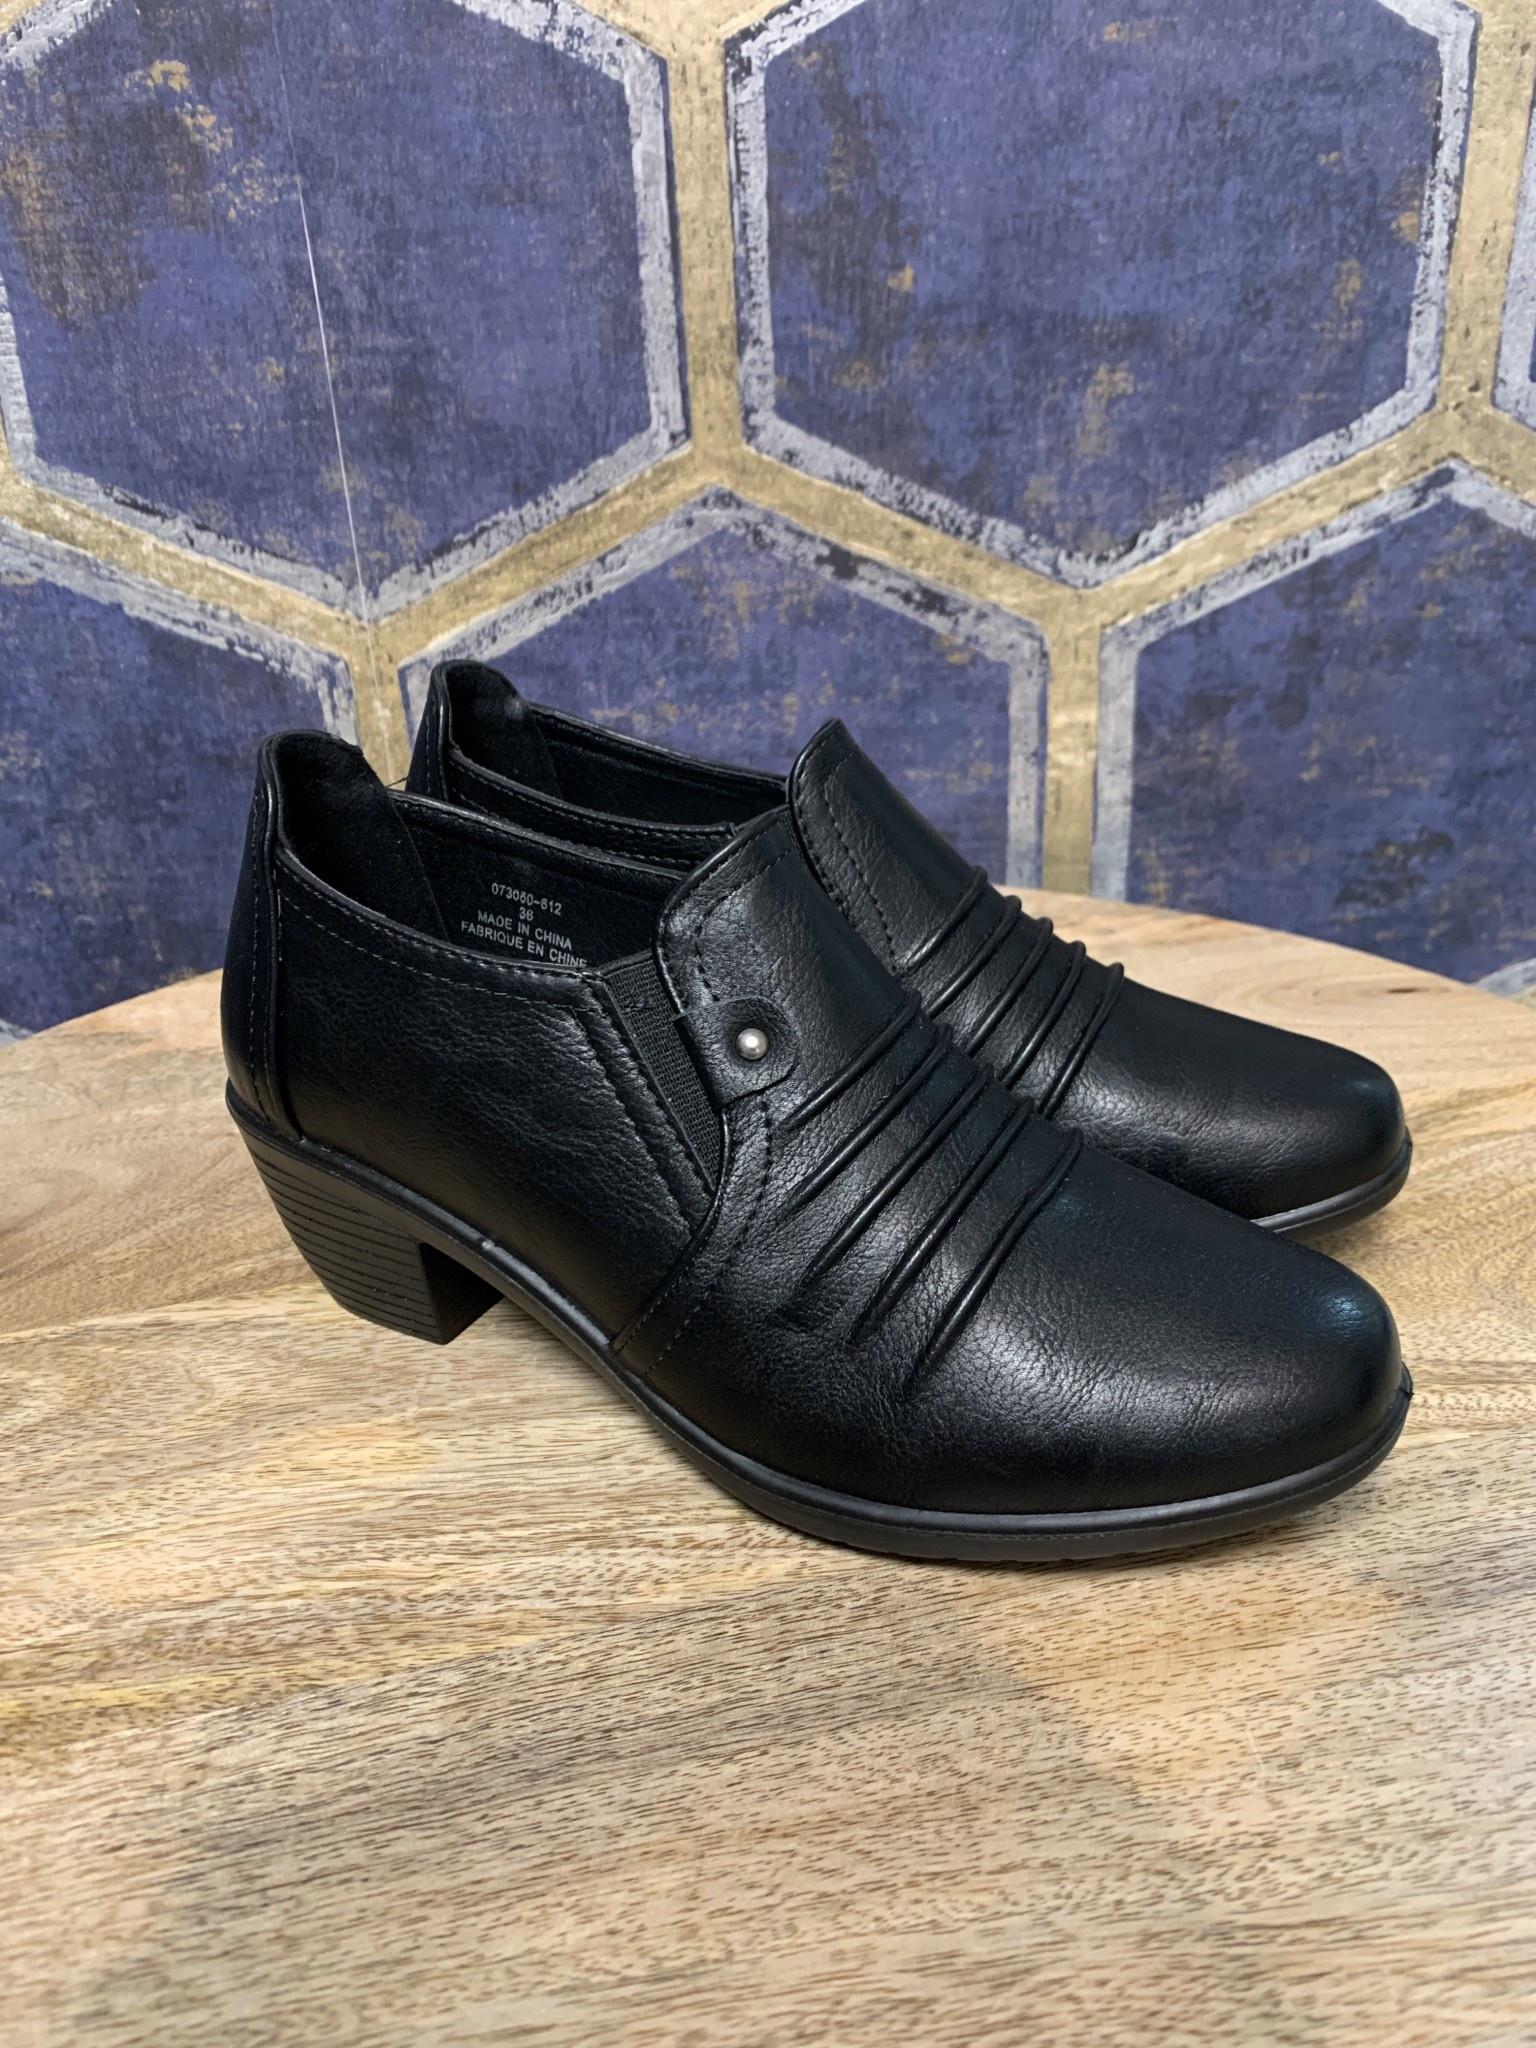 Ladies Gilmore Shoe